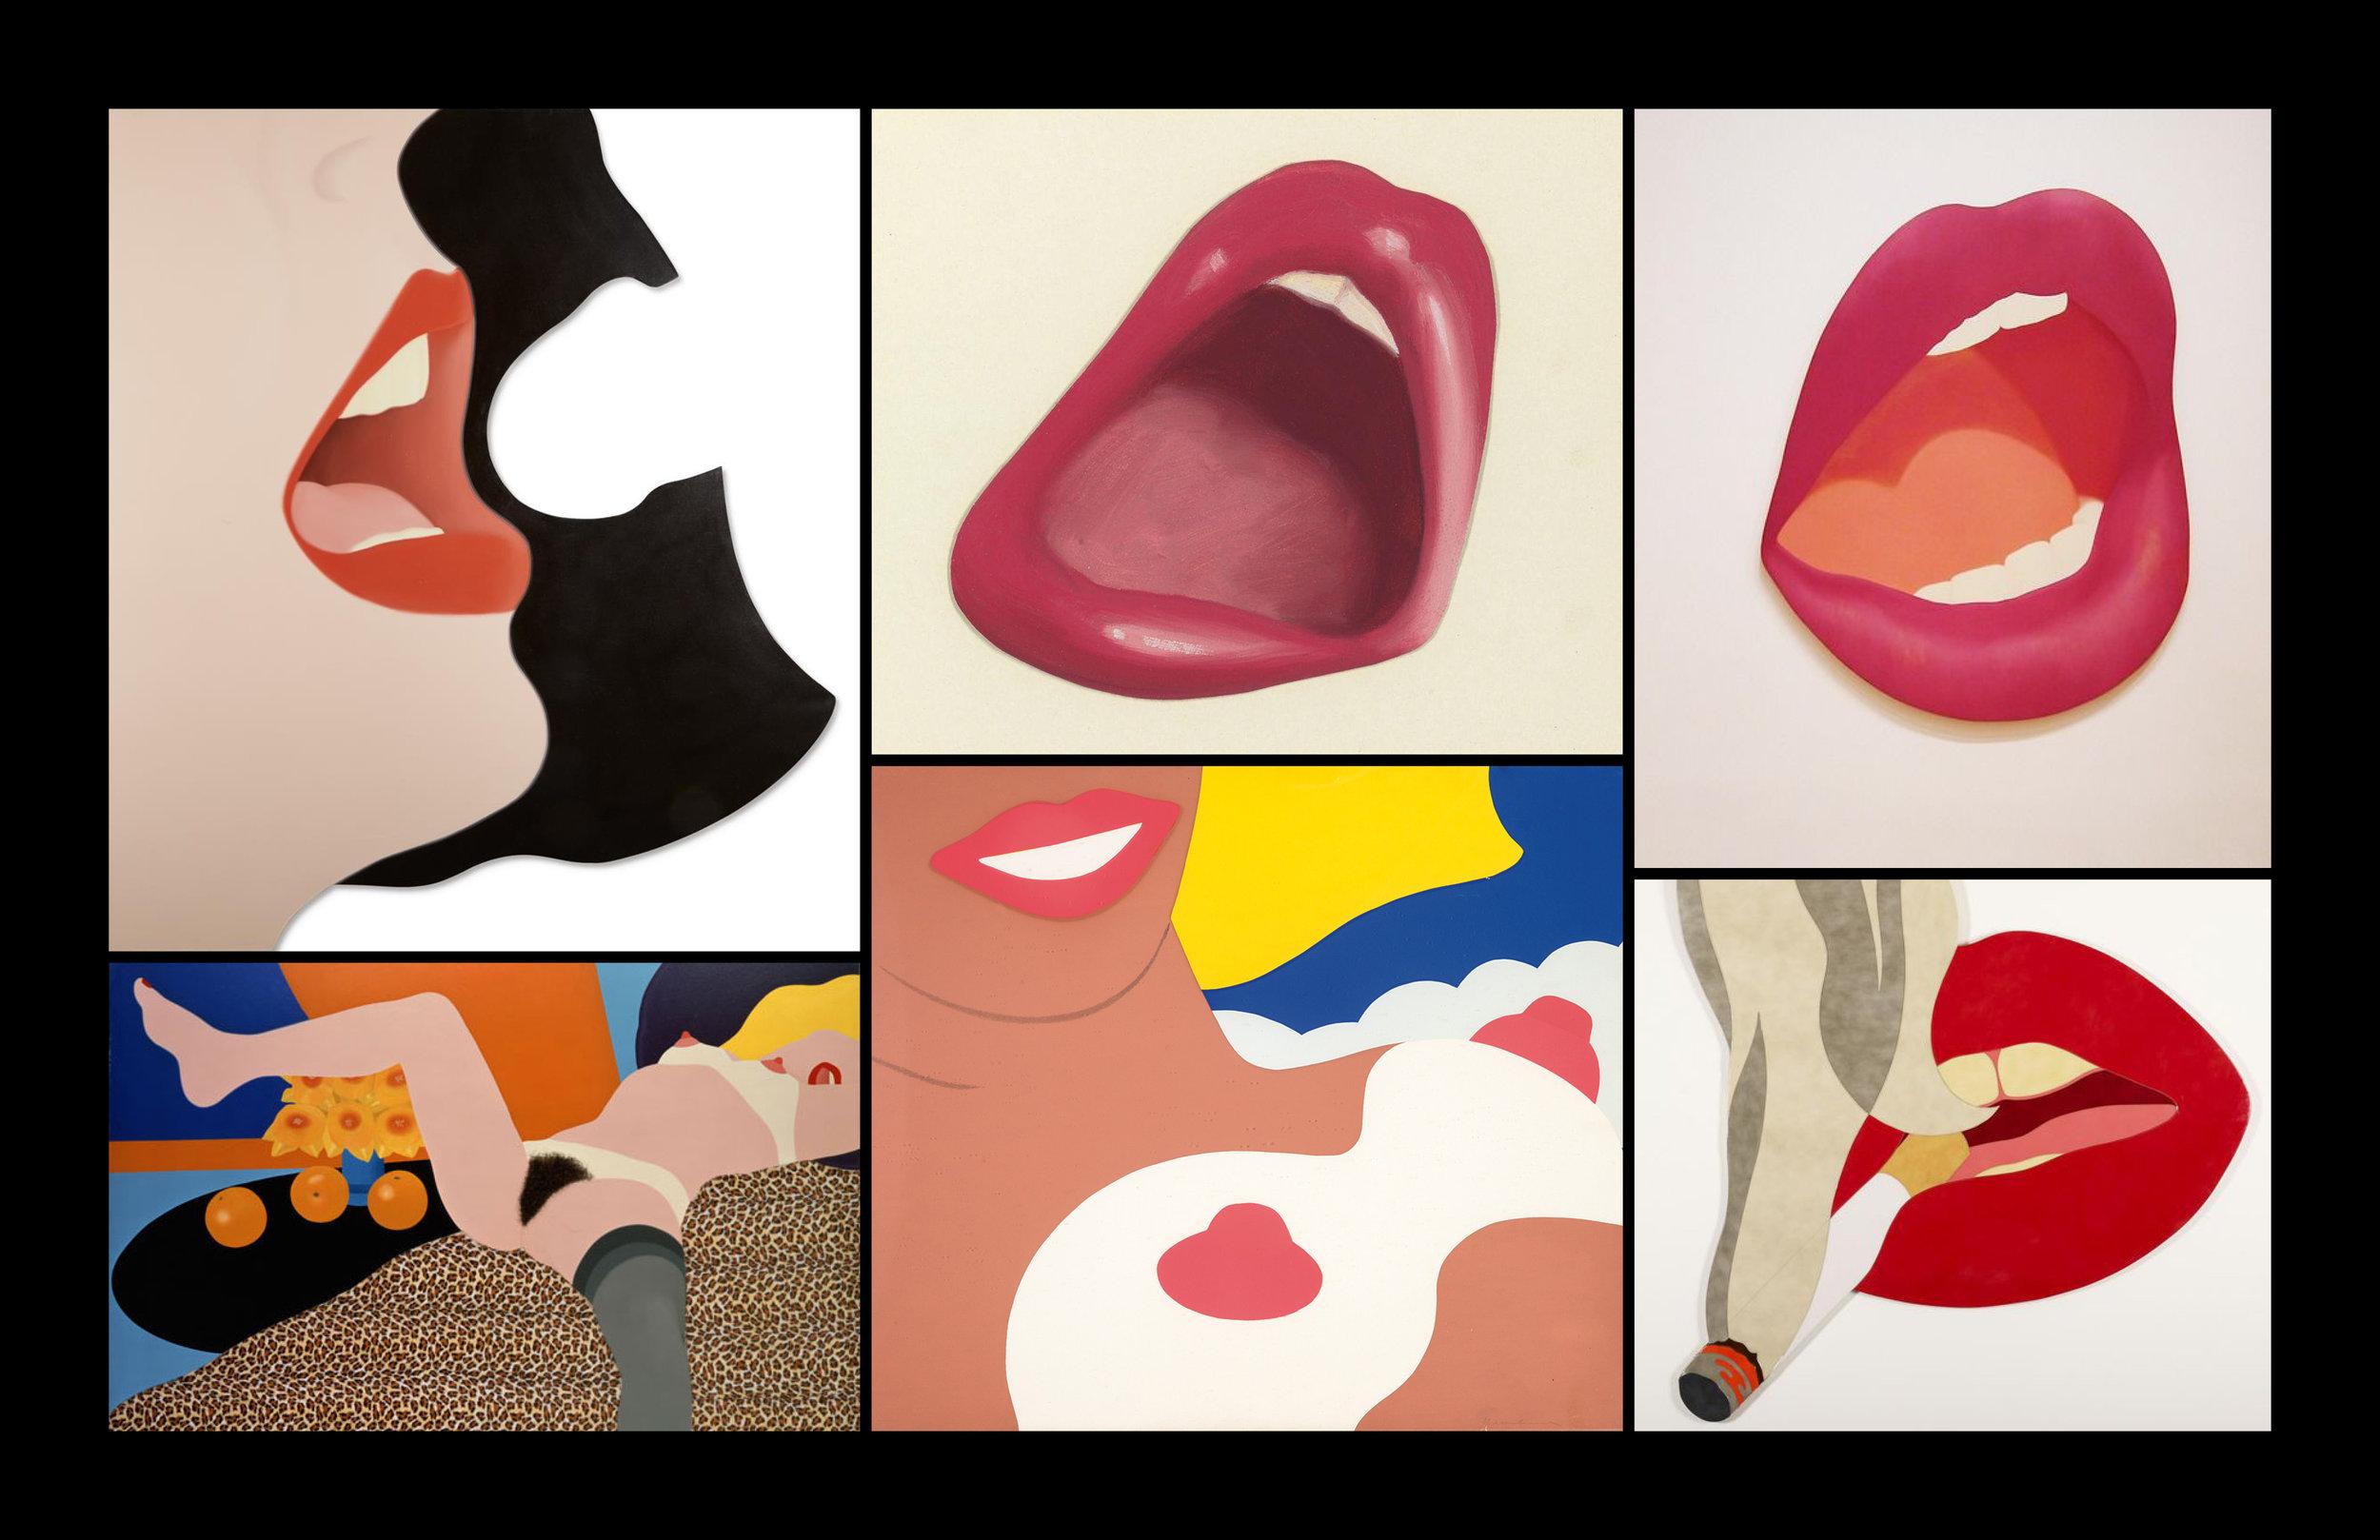 The explicit super flat pop art of Tom Wesselmann